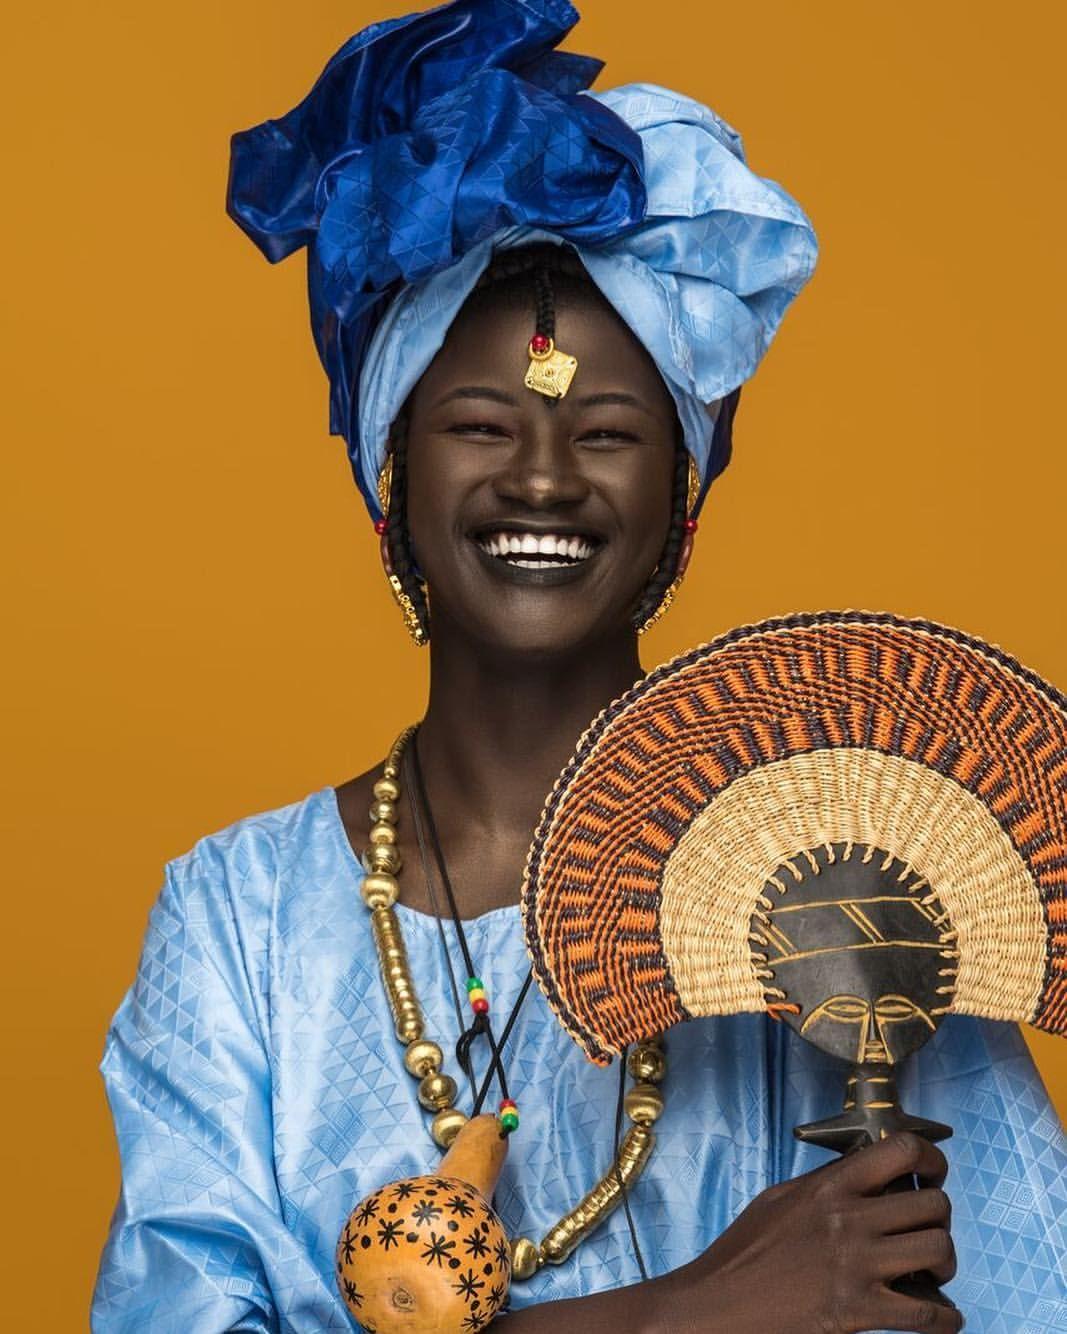 Je T Aime En Wolof : wolof, Native, Language, Wolof., Think, Wolof,, Translate, French, English., Languages, Speak?, #melaninpoppi…, African, Culture,, African,, Senegal